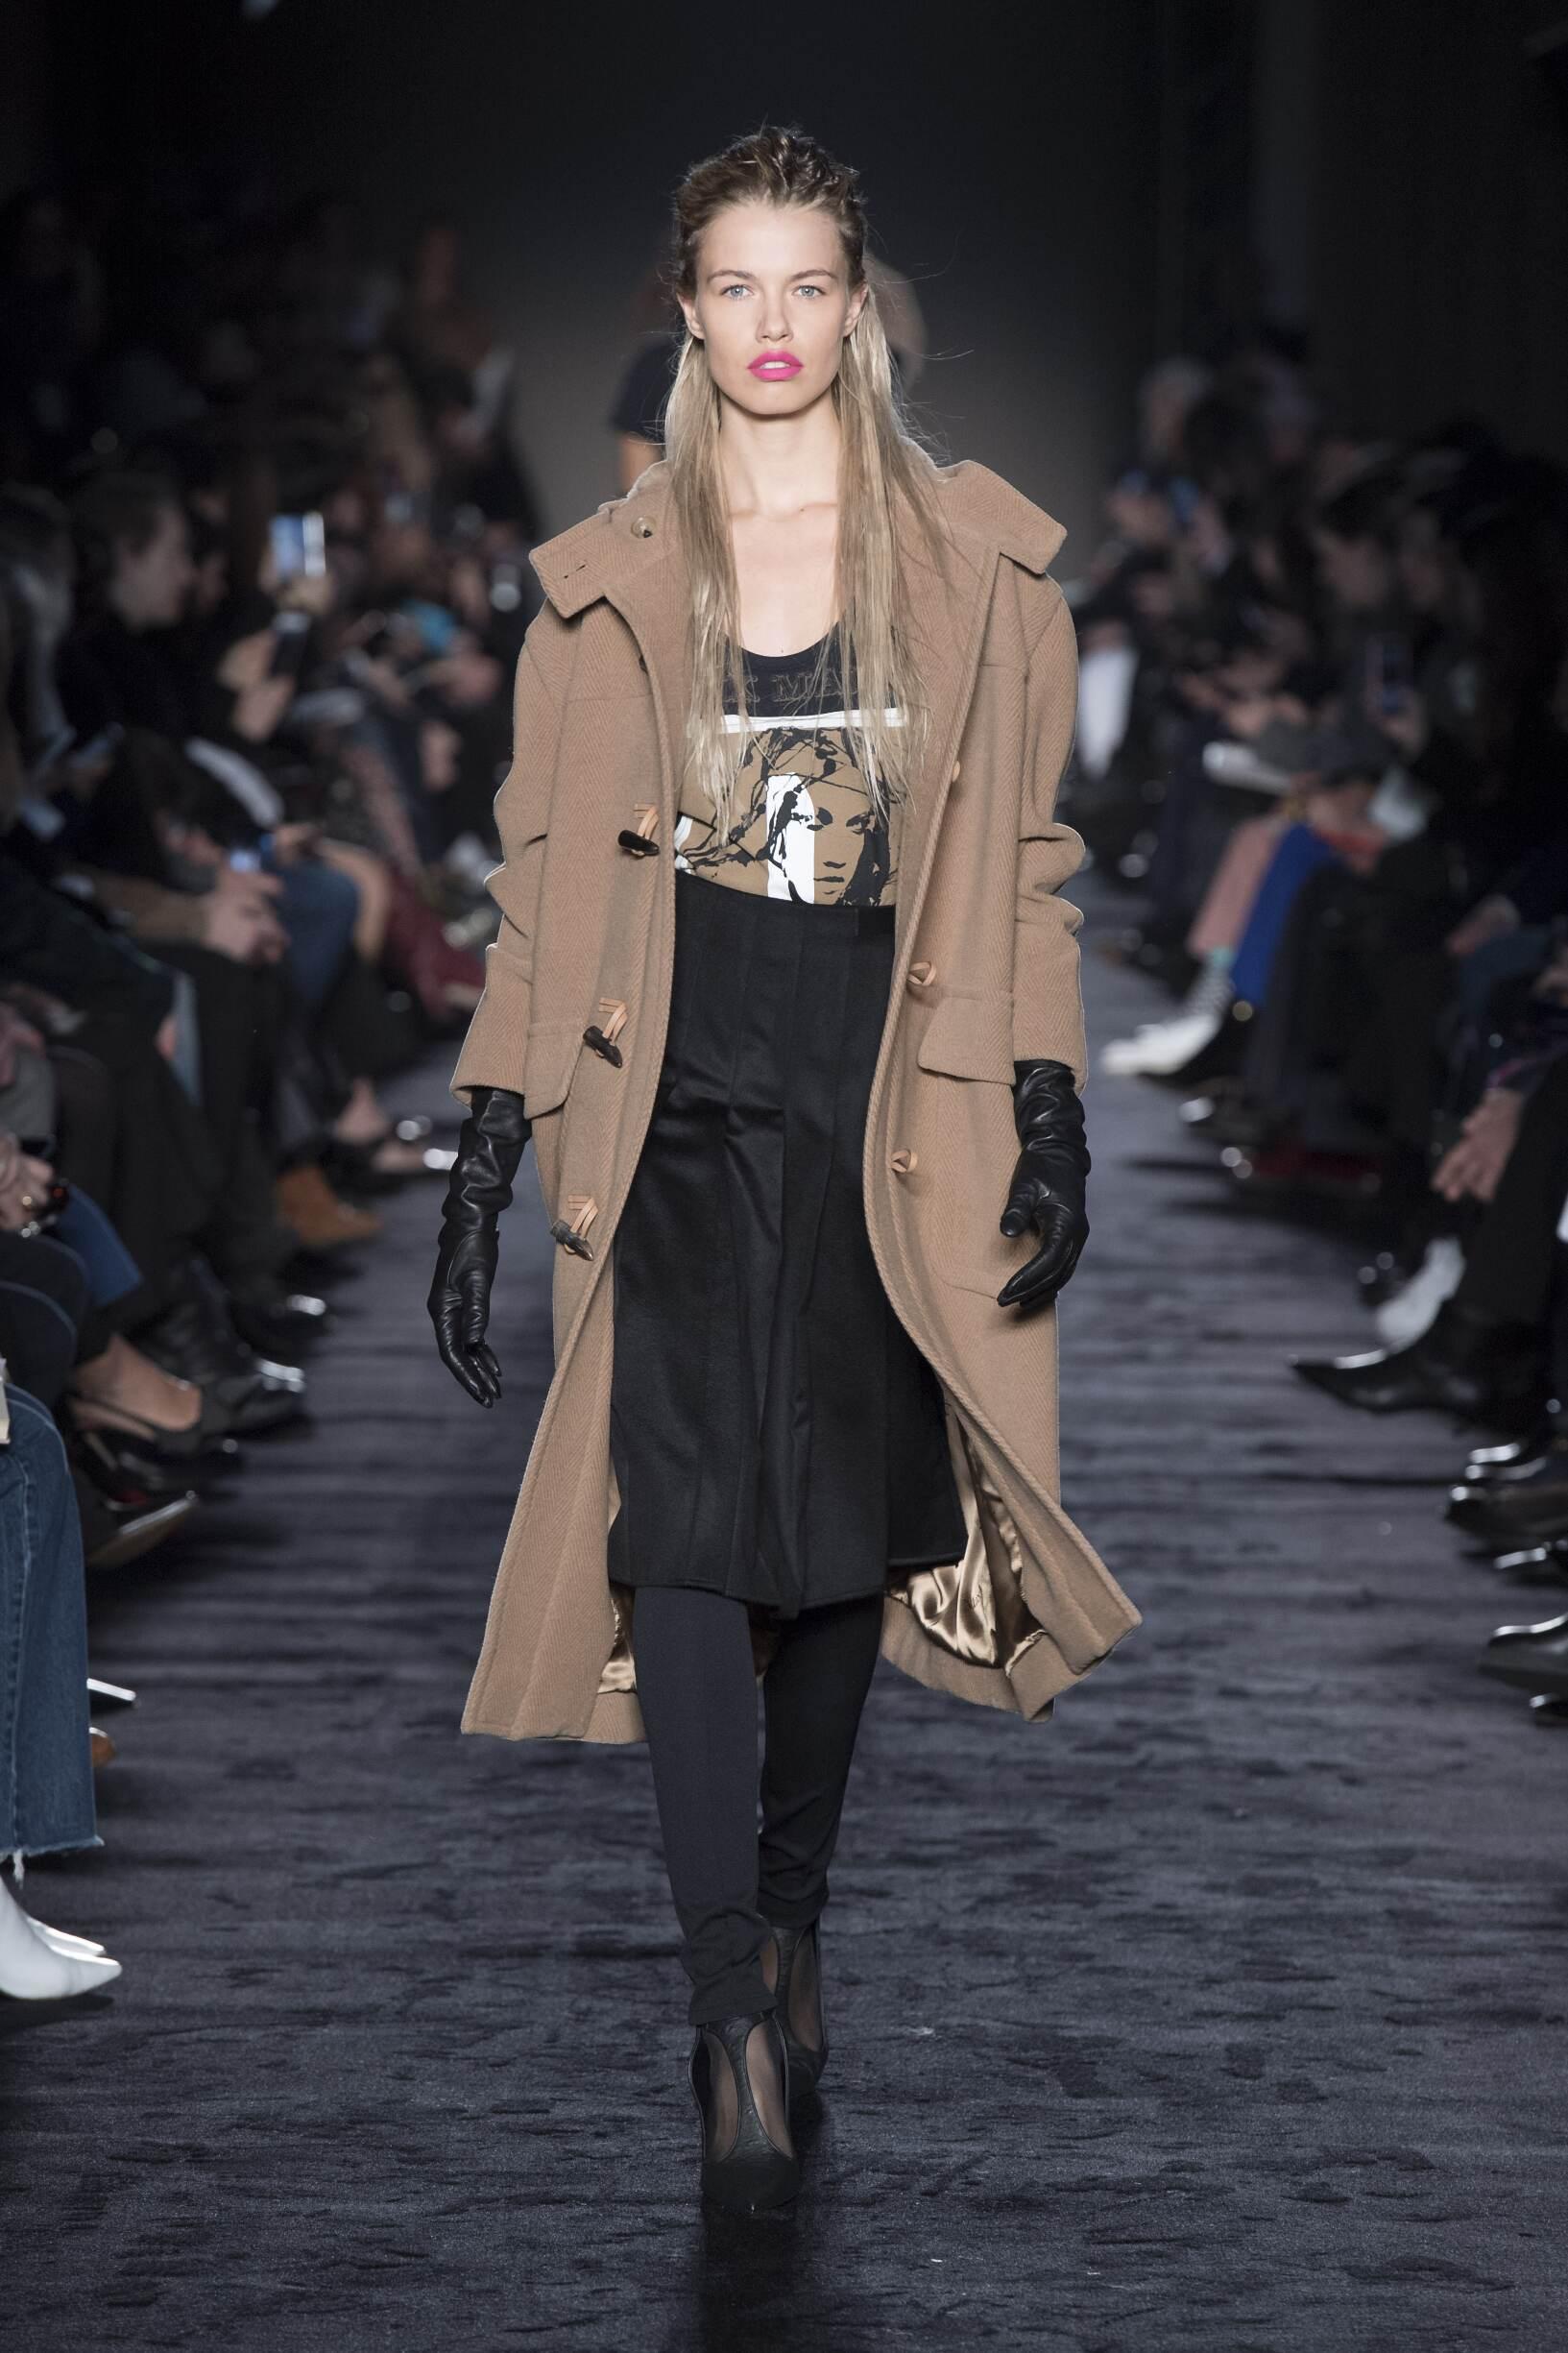 Fashion Woman Model Max Mara Catwalk